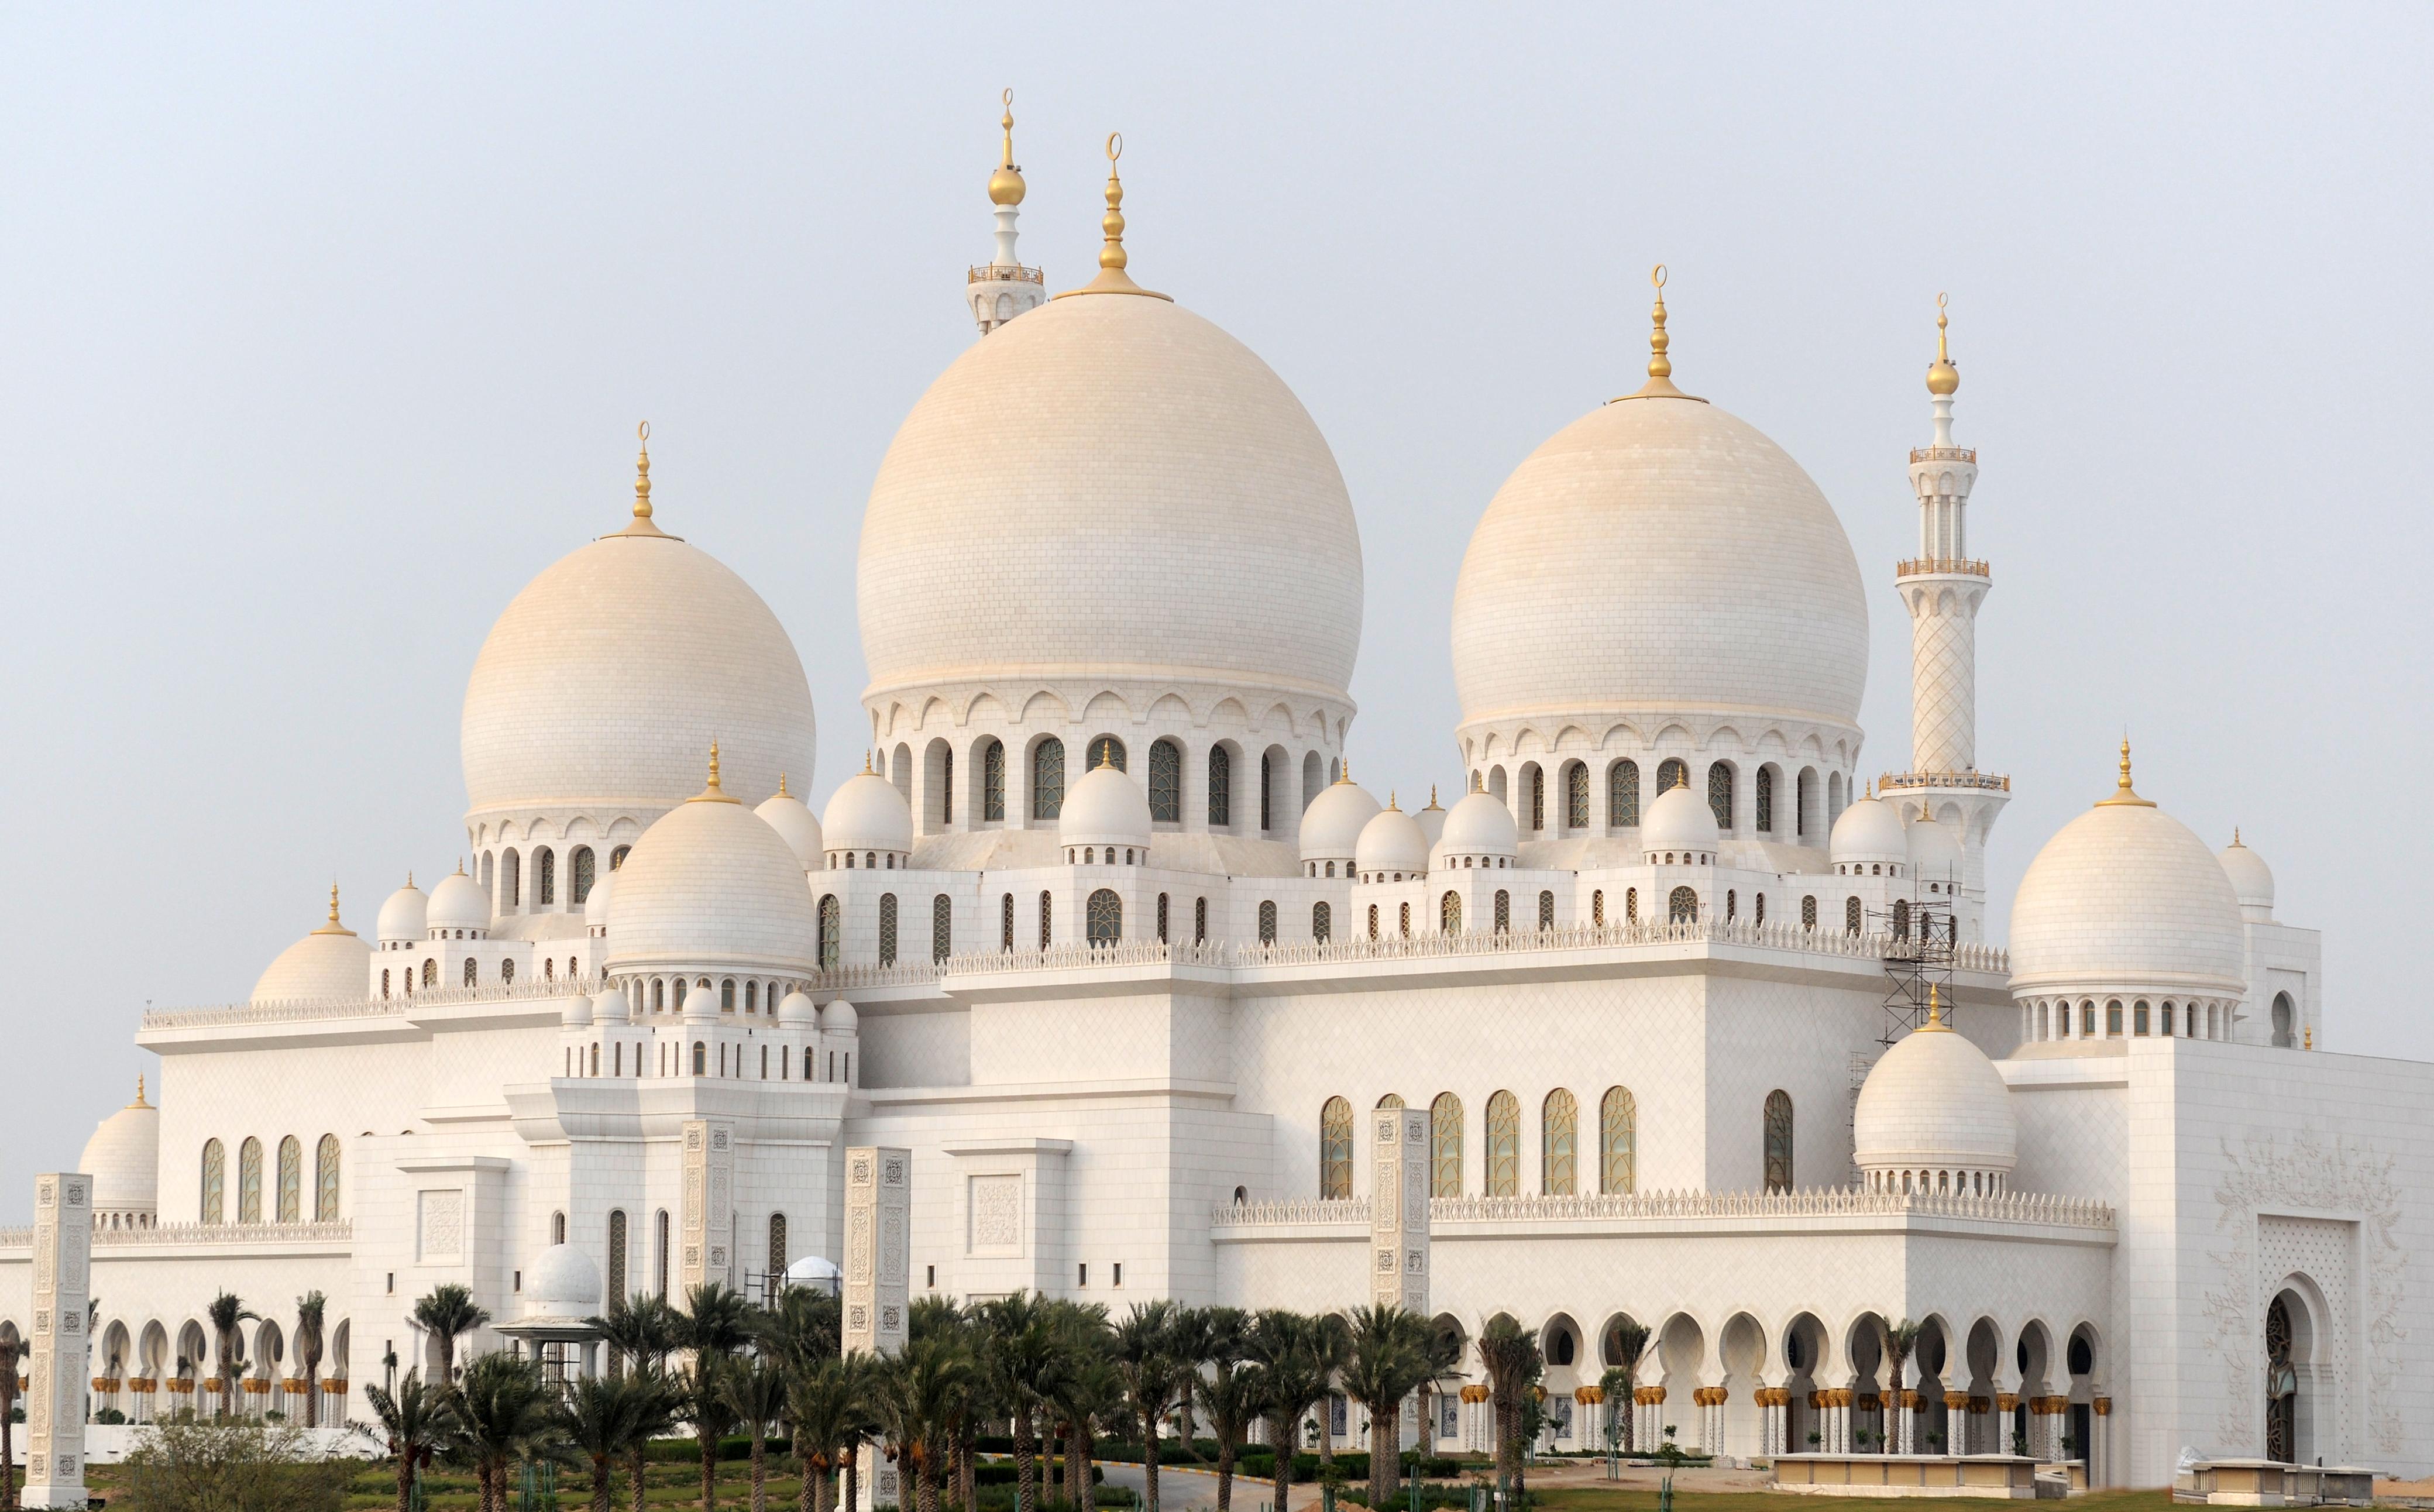 Sheikh Zayed Morsque